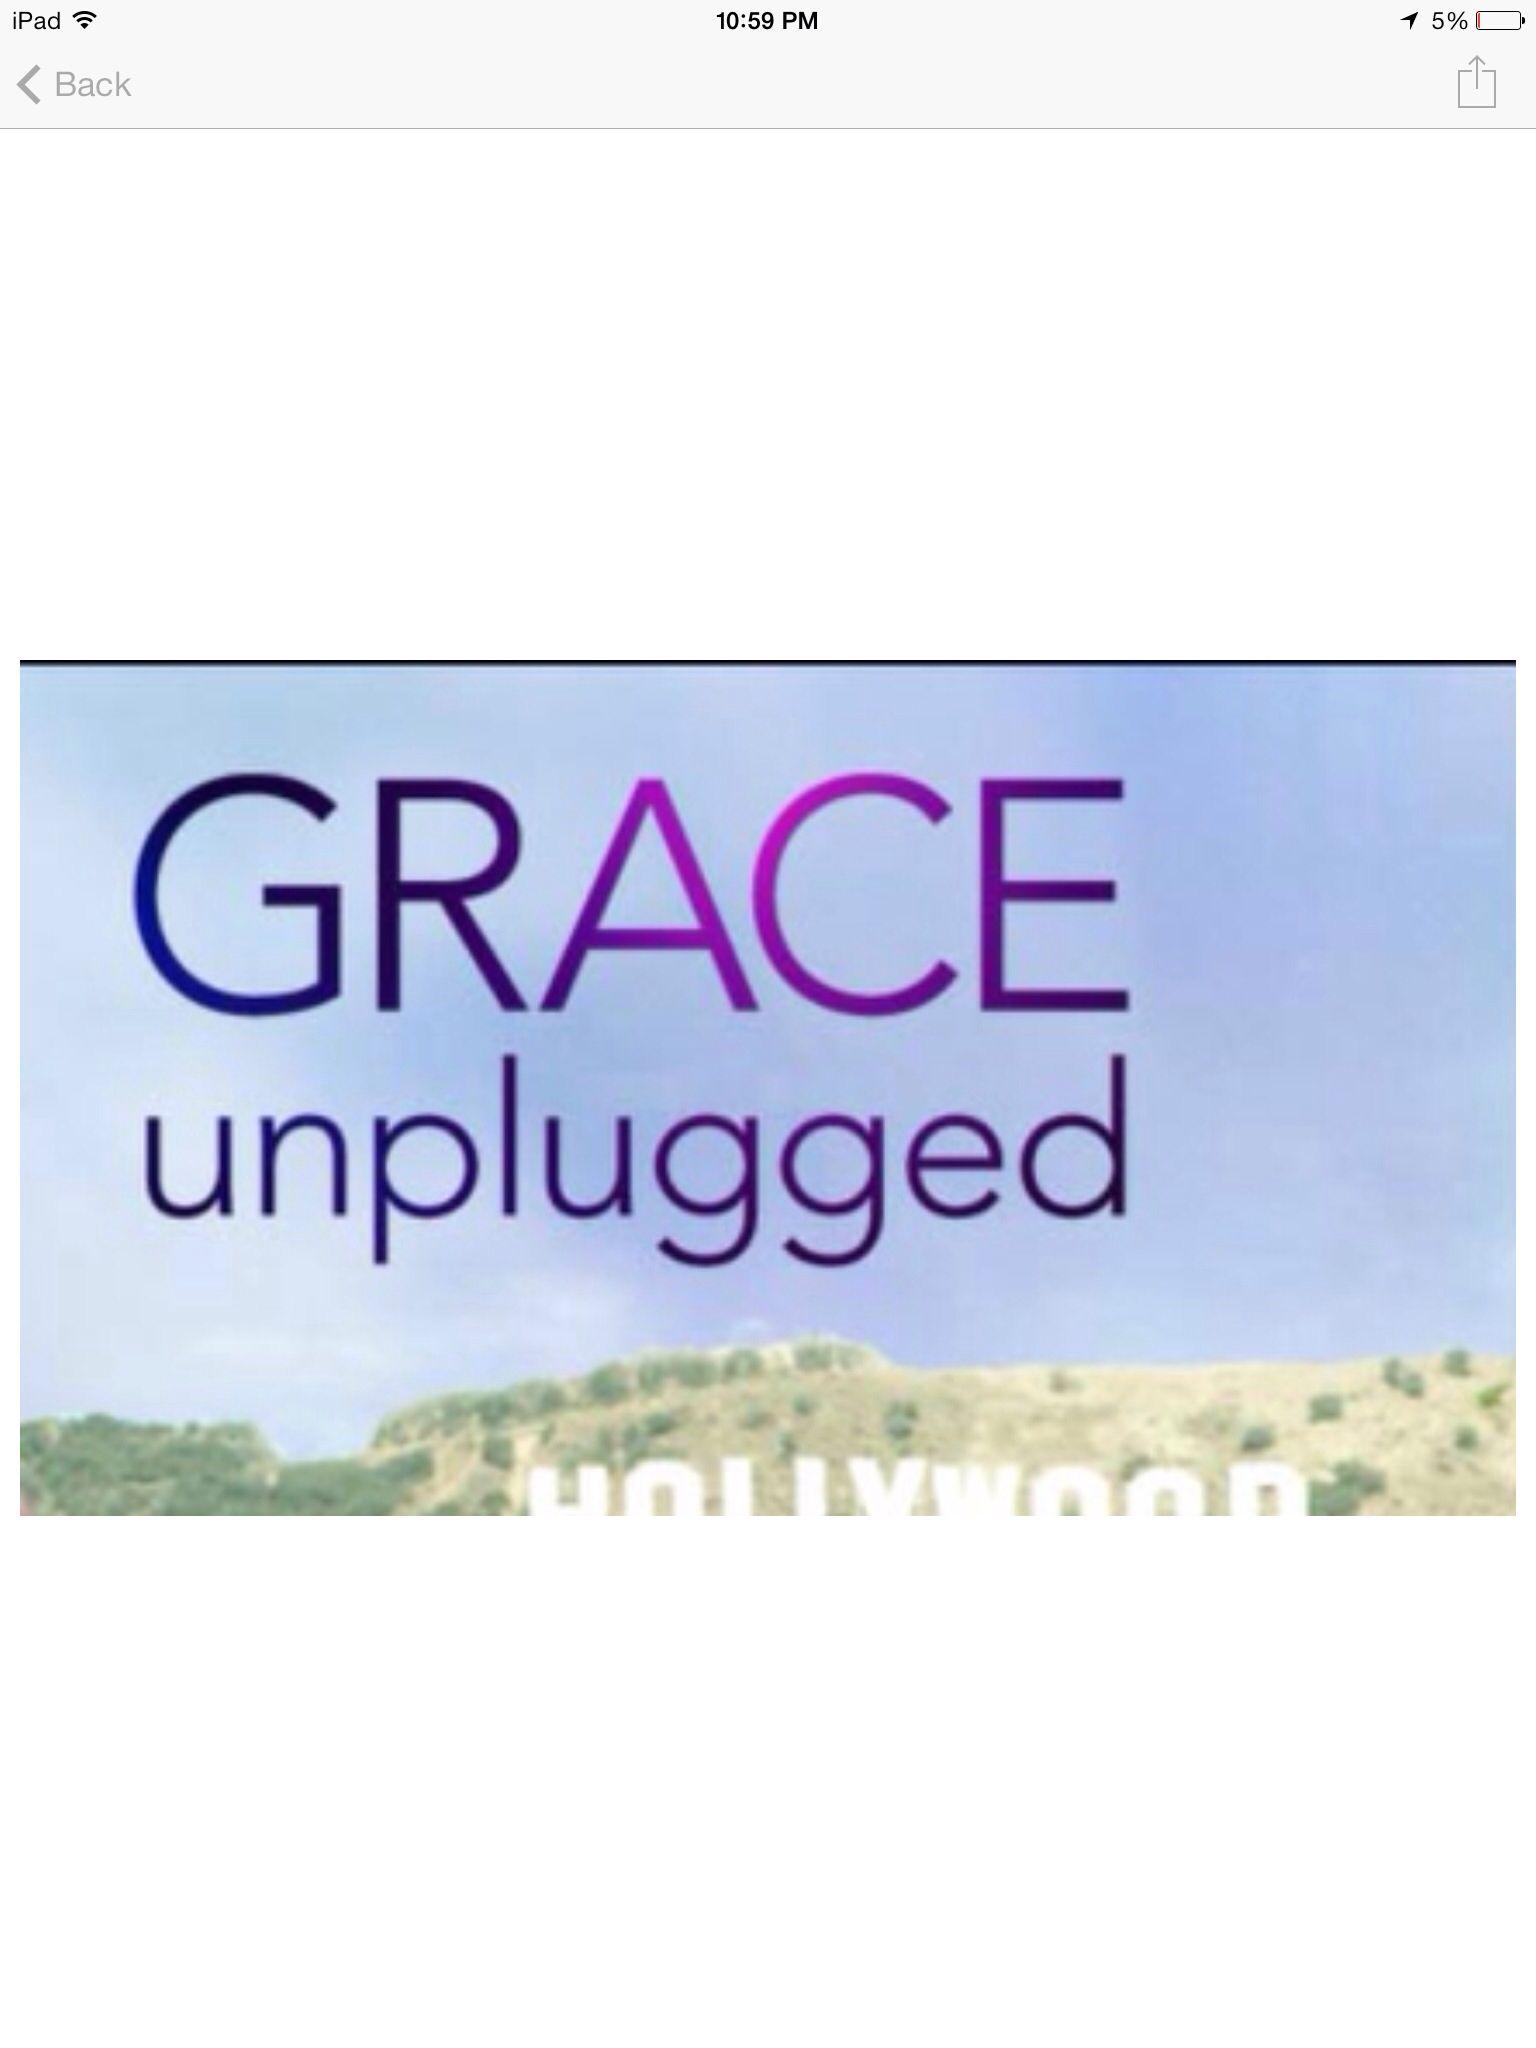 Unplugged...